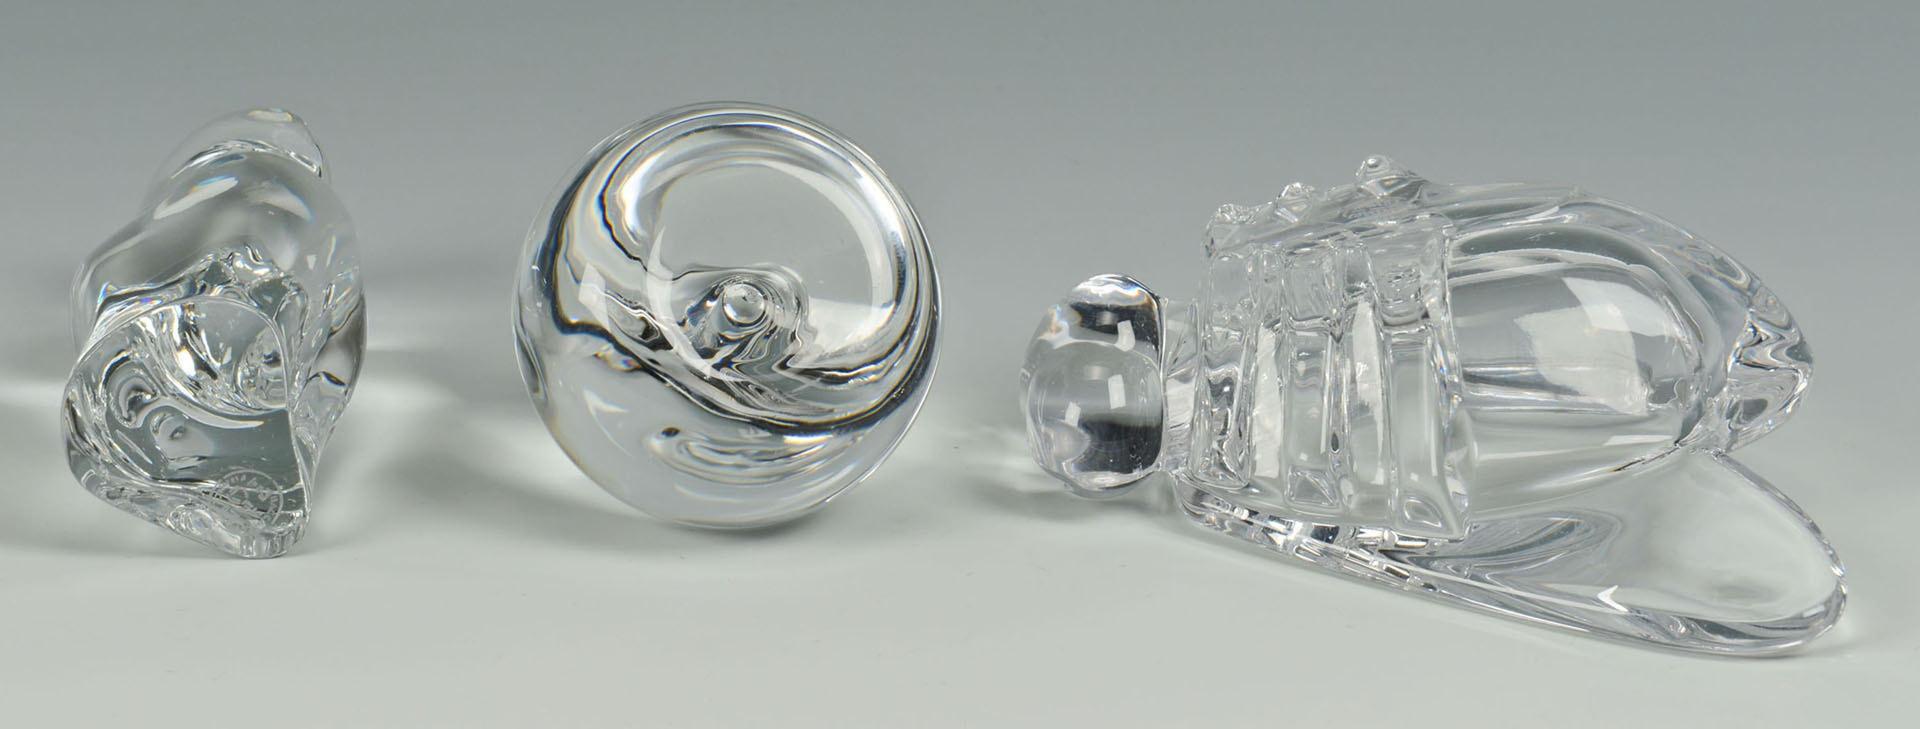 Lot 508: 3 art glass objects: Steuben, Baccarat, Vannes